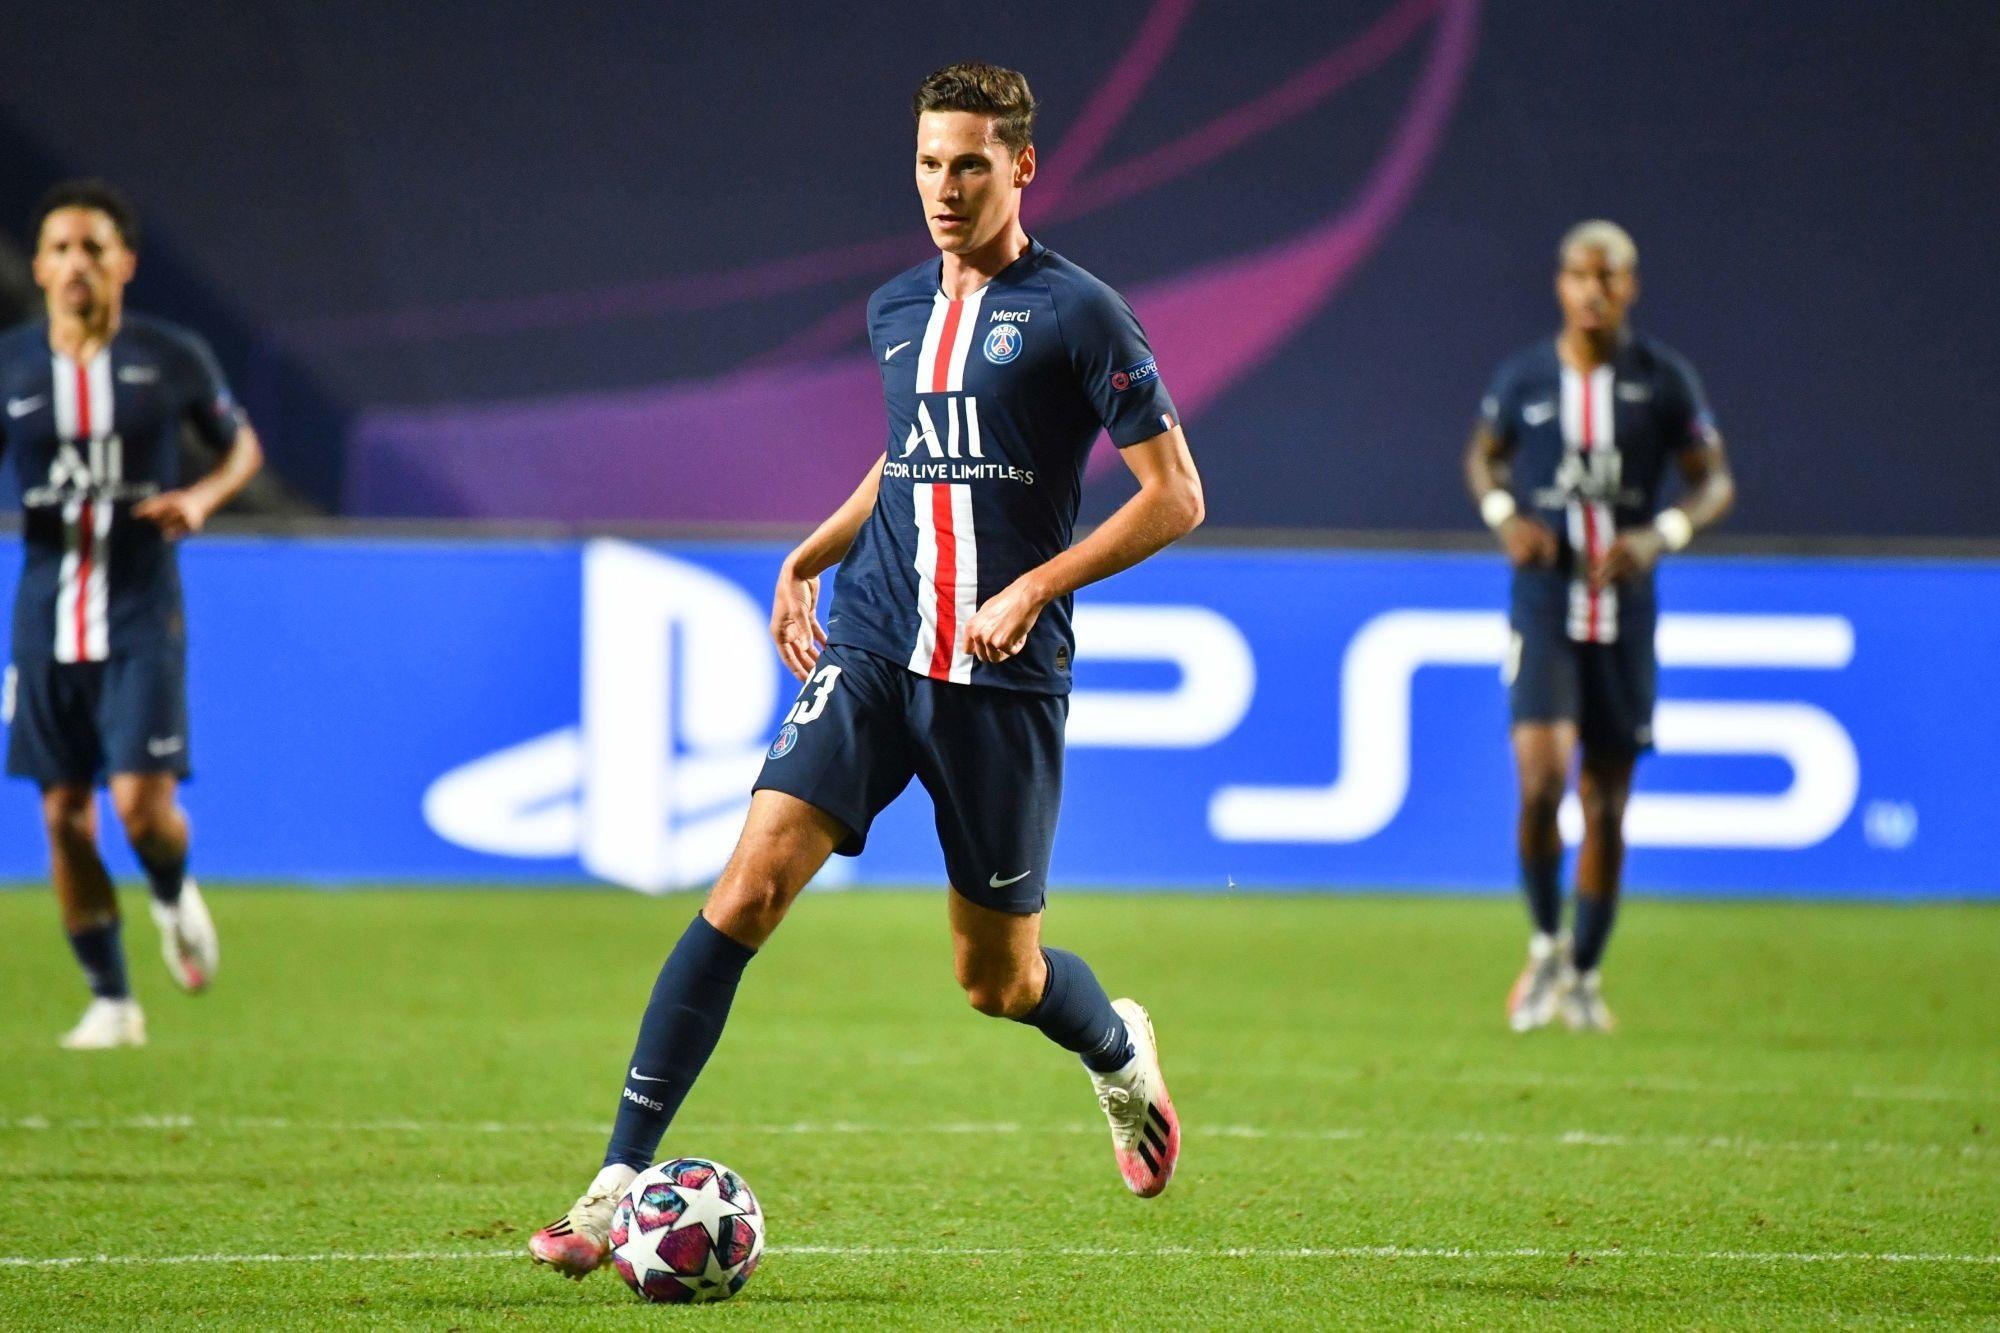 Mercato - Draxler compte rester au PSG et attendre la fin de son contrat, confirme Sky